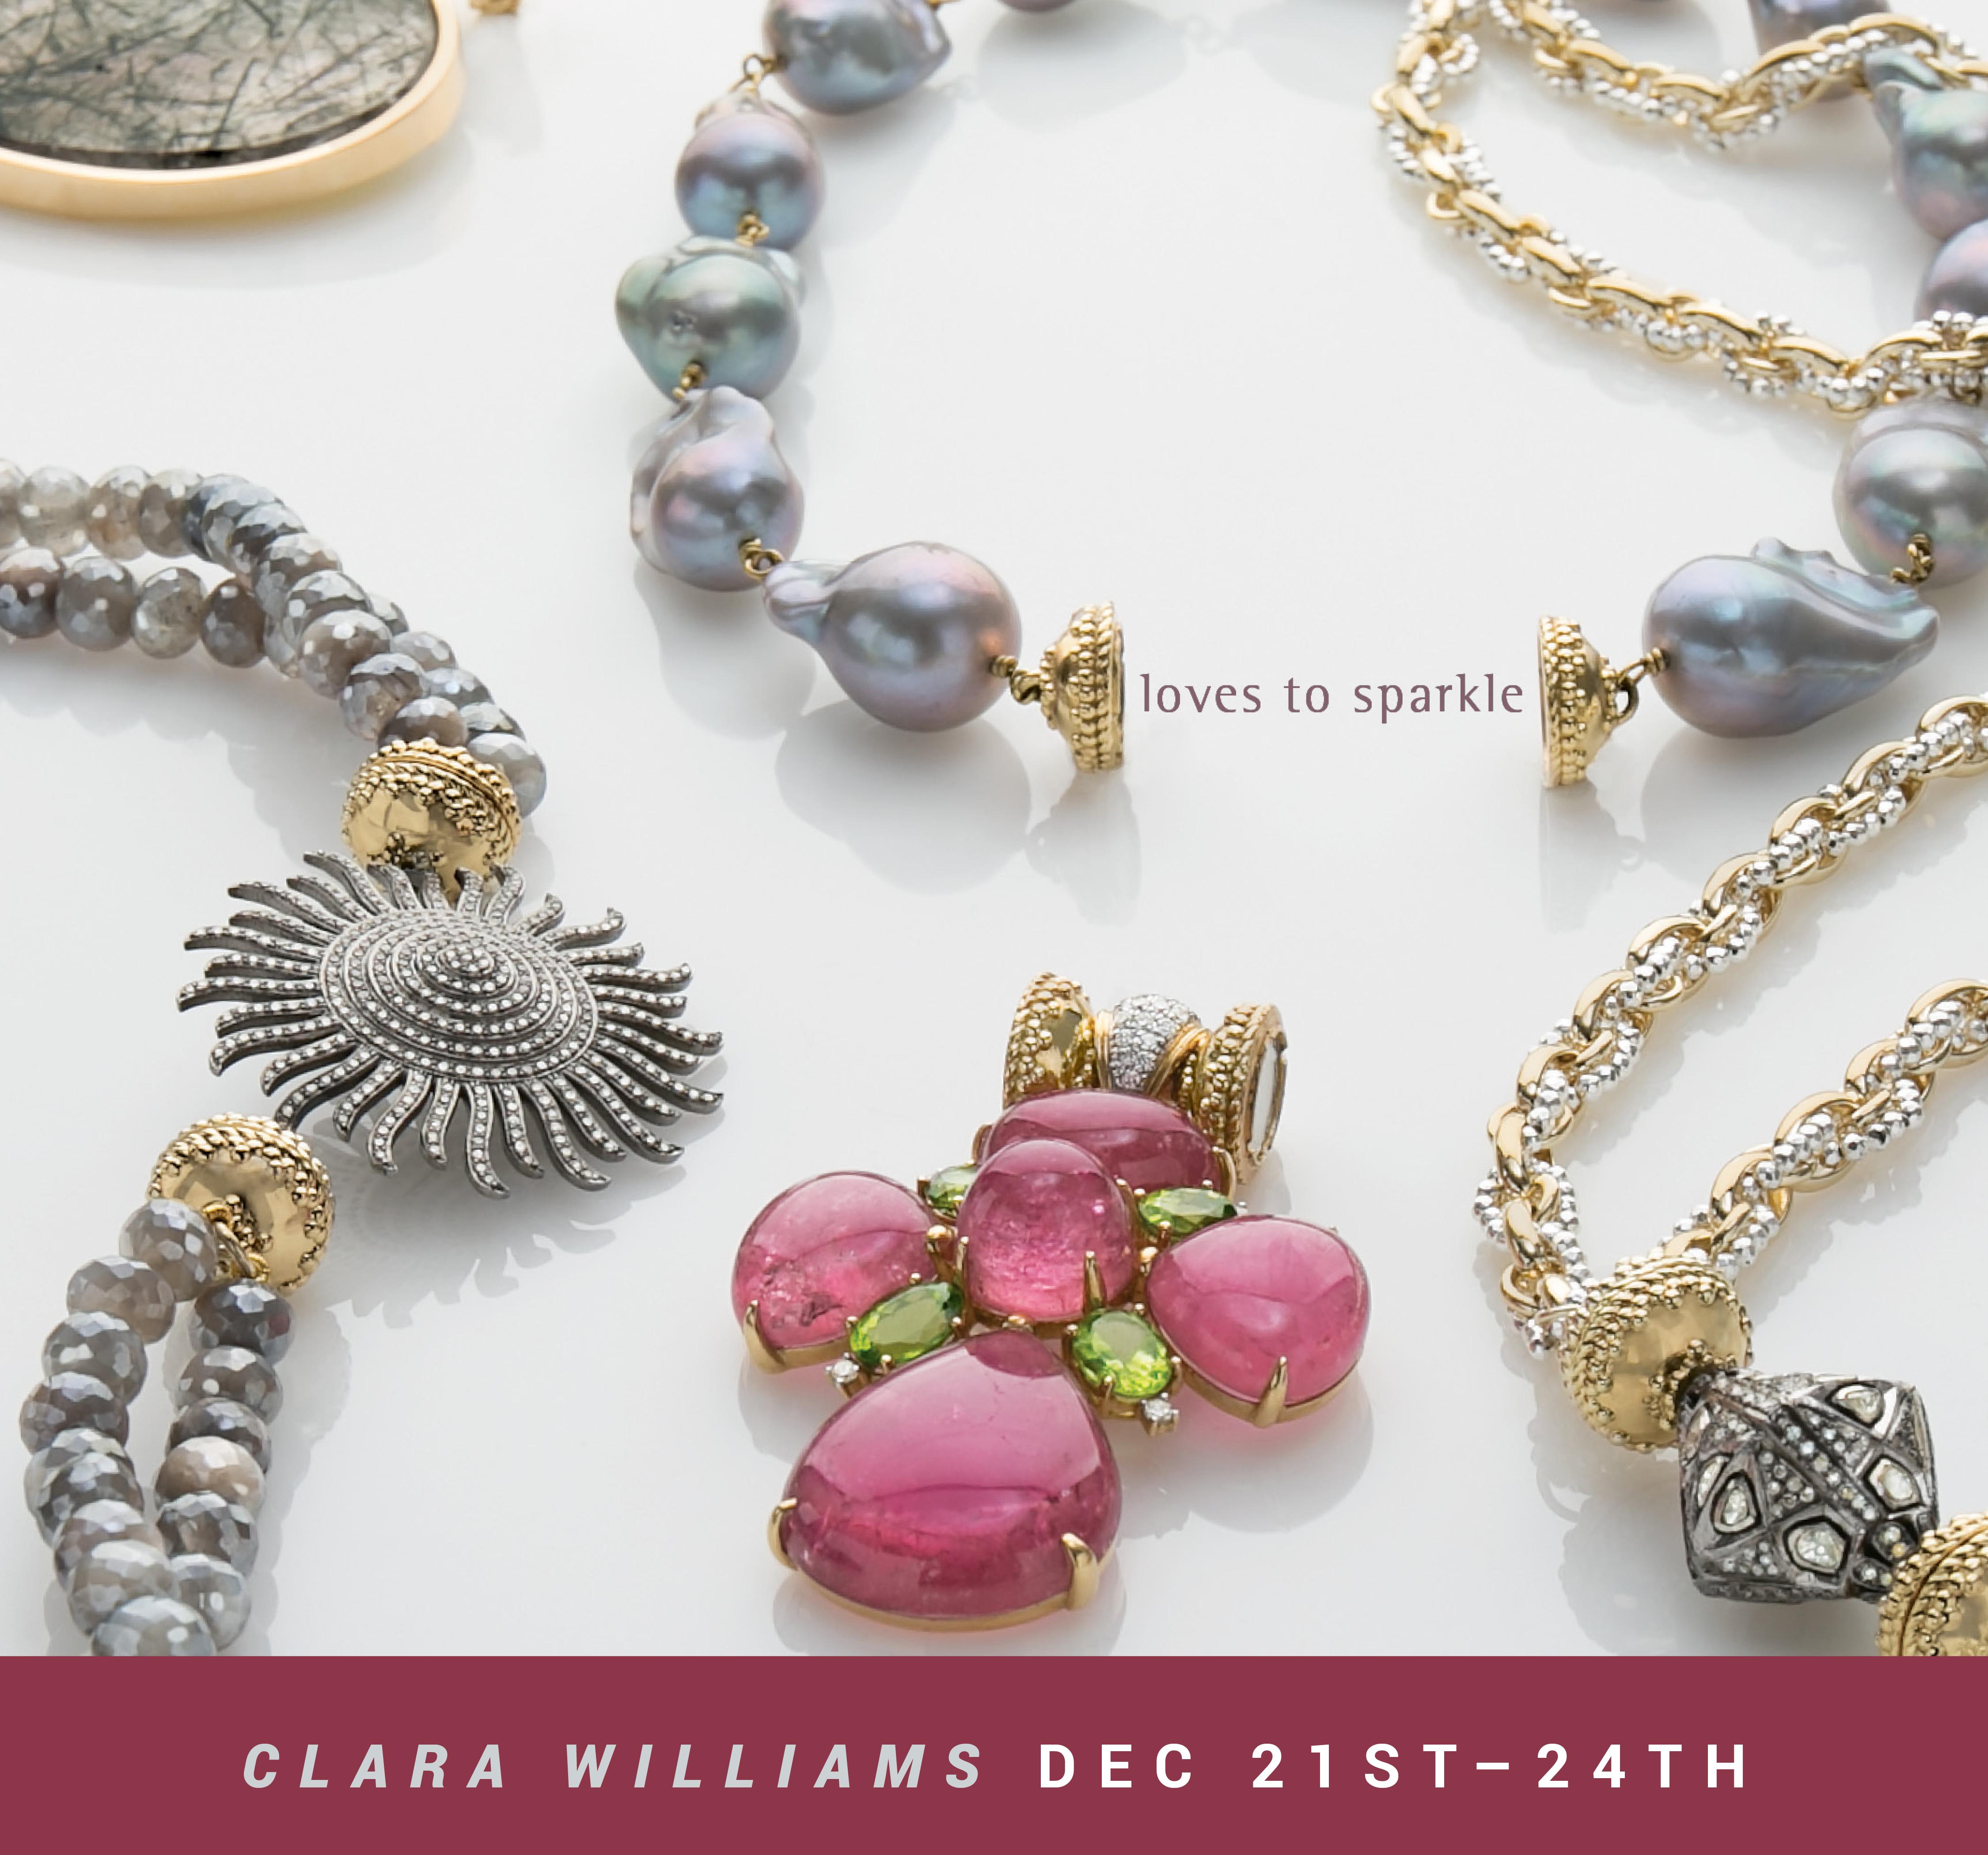 Clara Williams Holiday Trunk Show